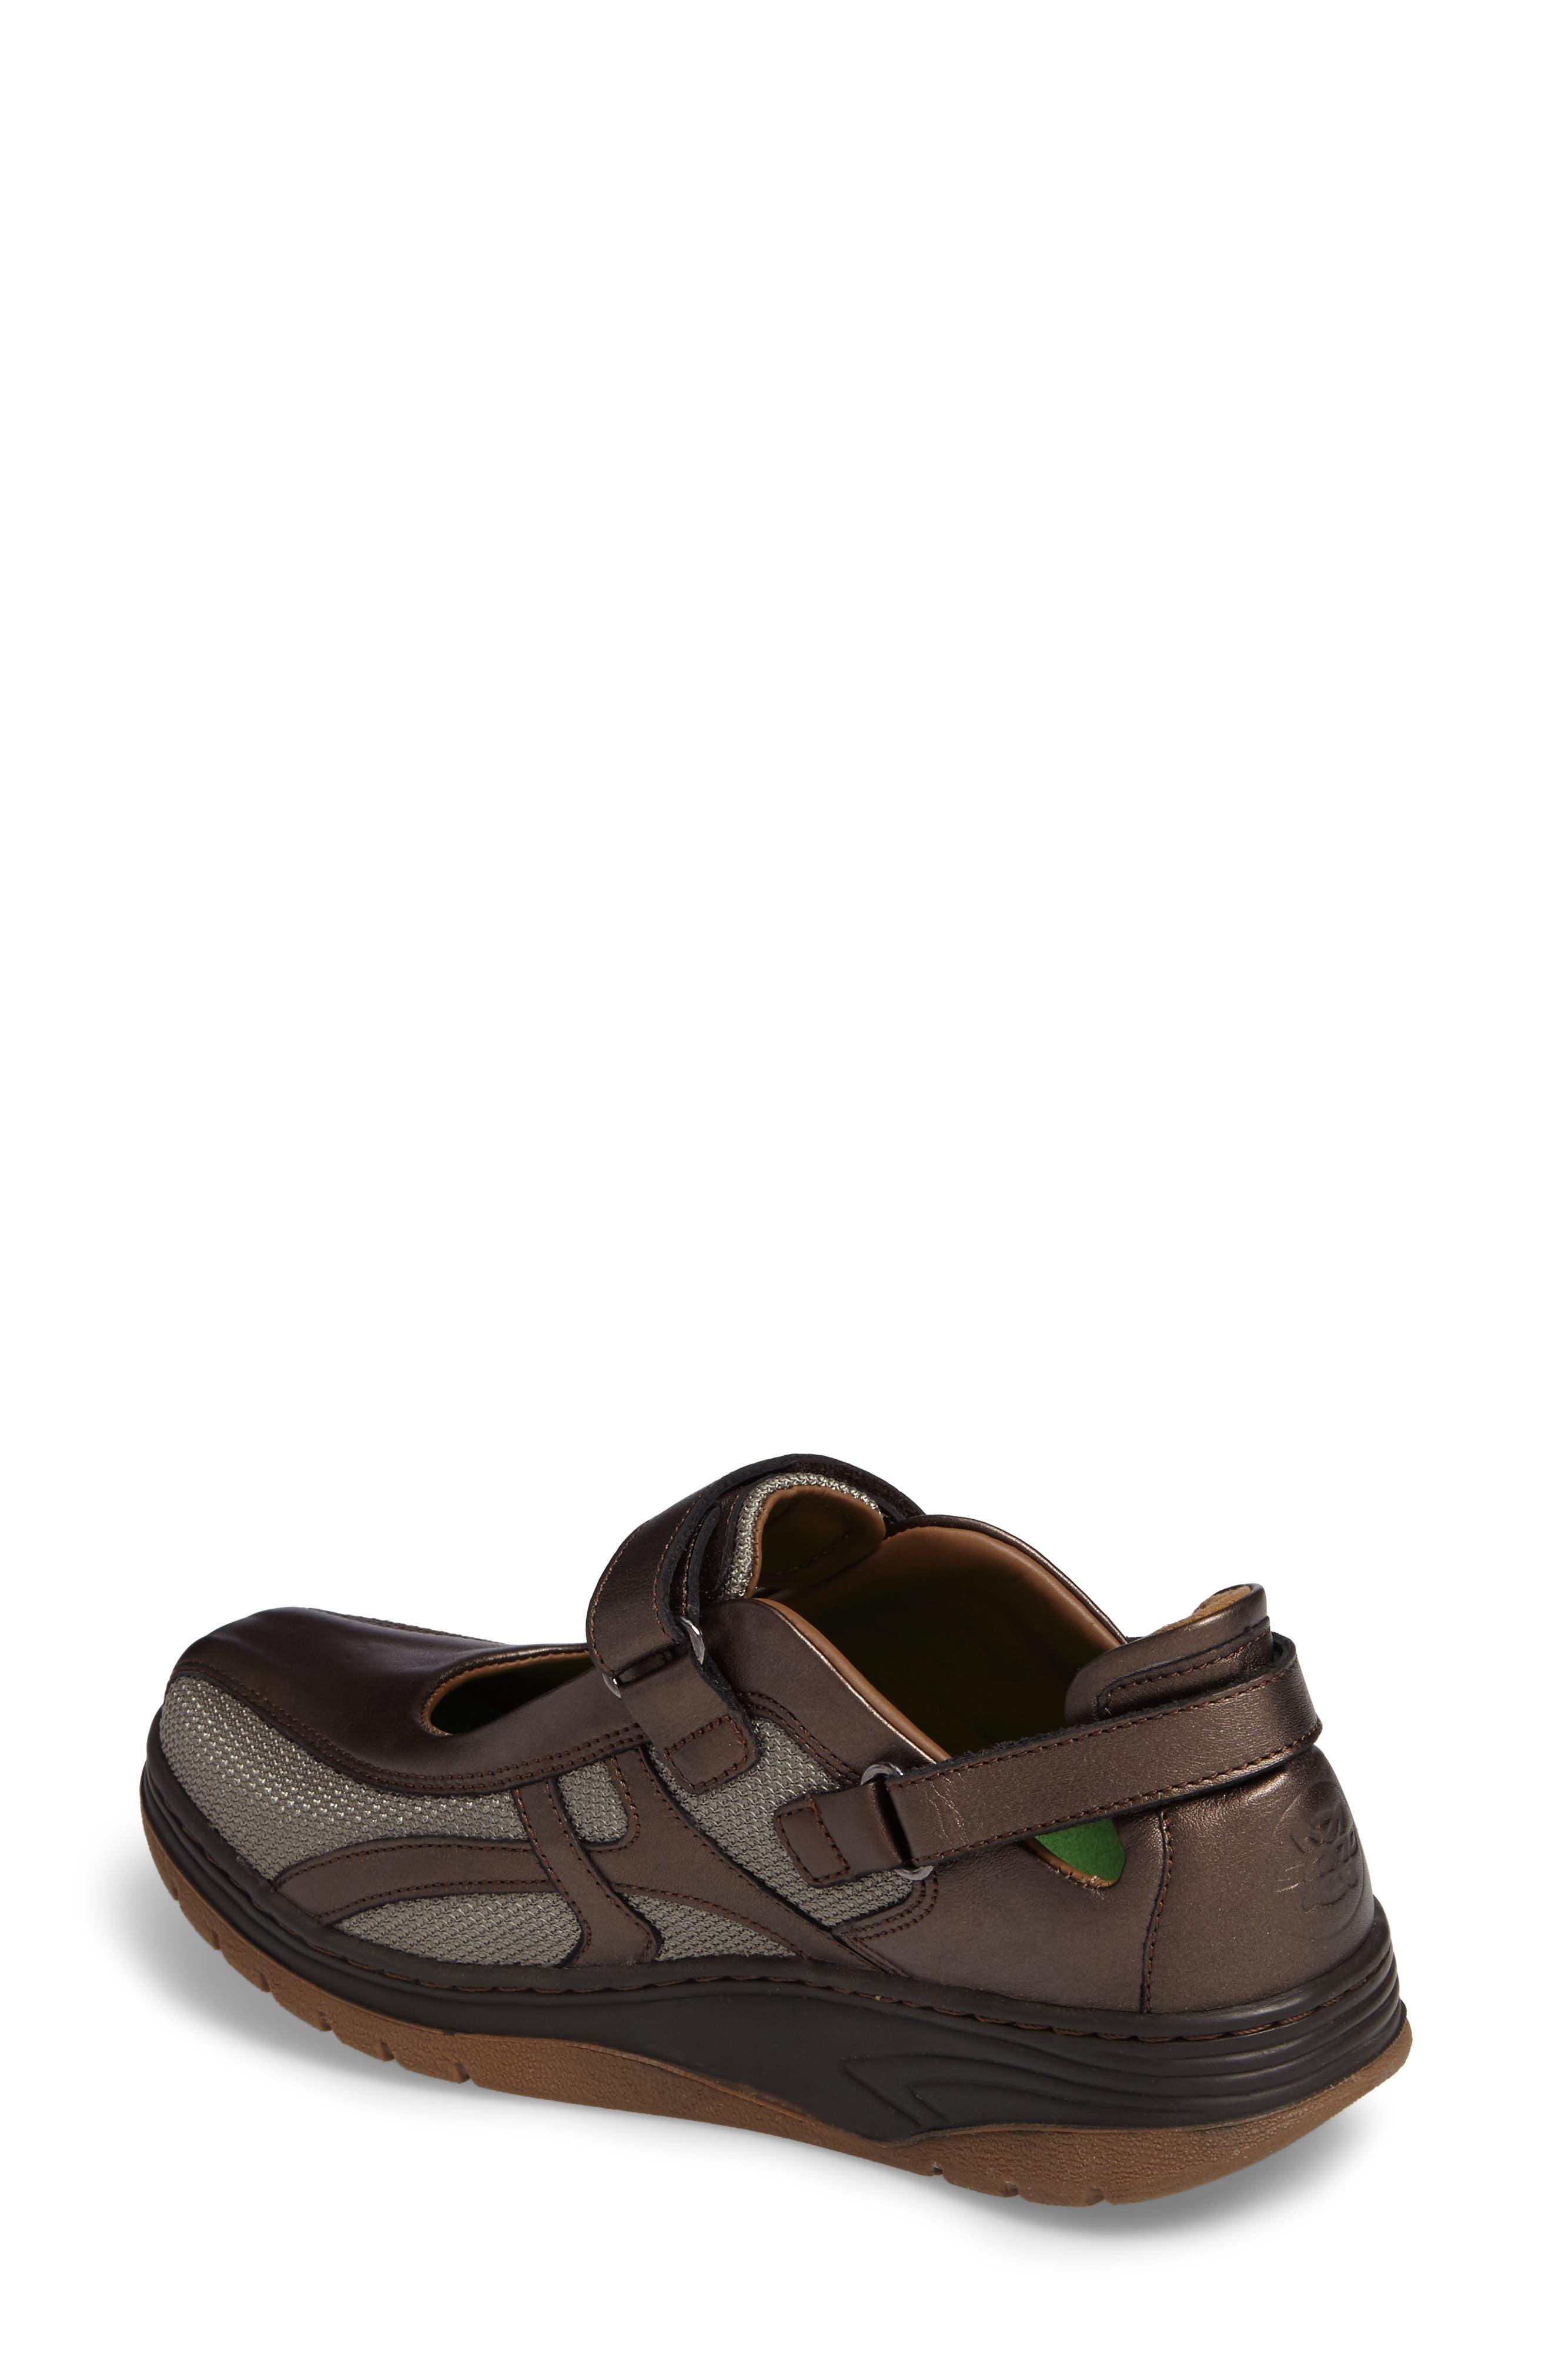 Alternate Image 2  - Sano by Mephisto 'Excess' Walking Shoe (Women)